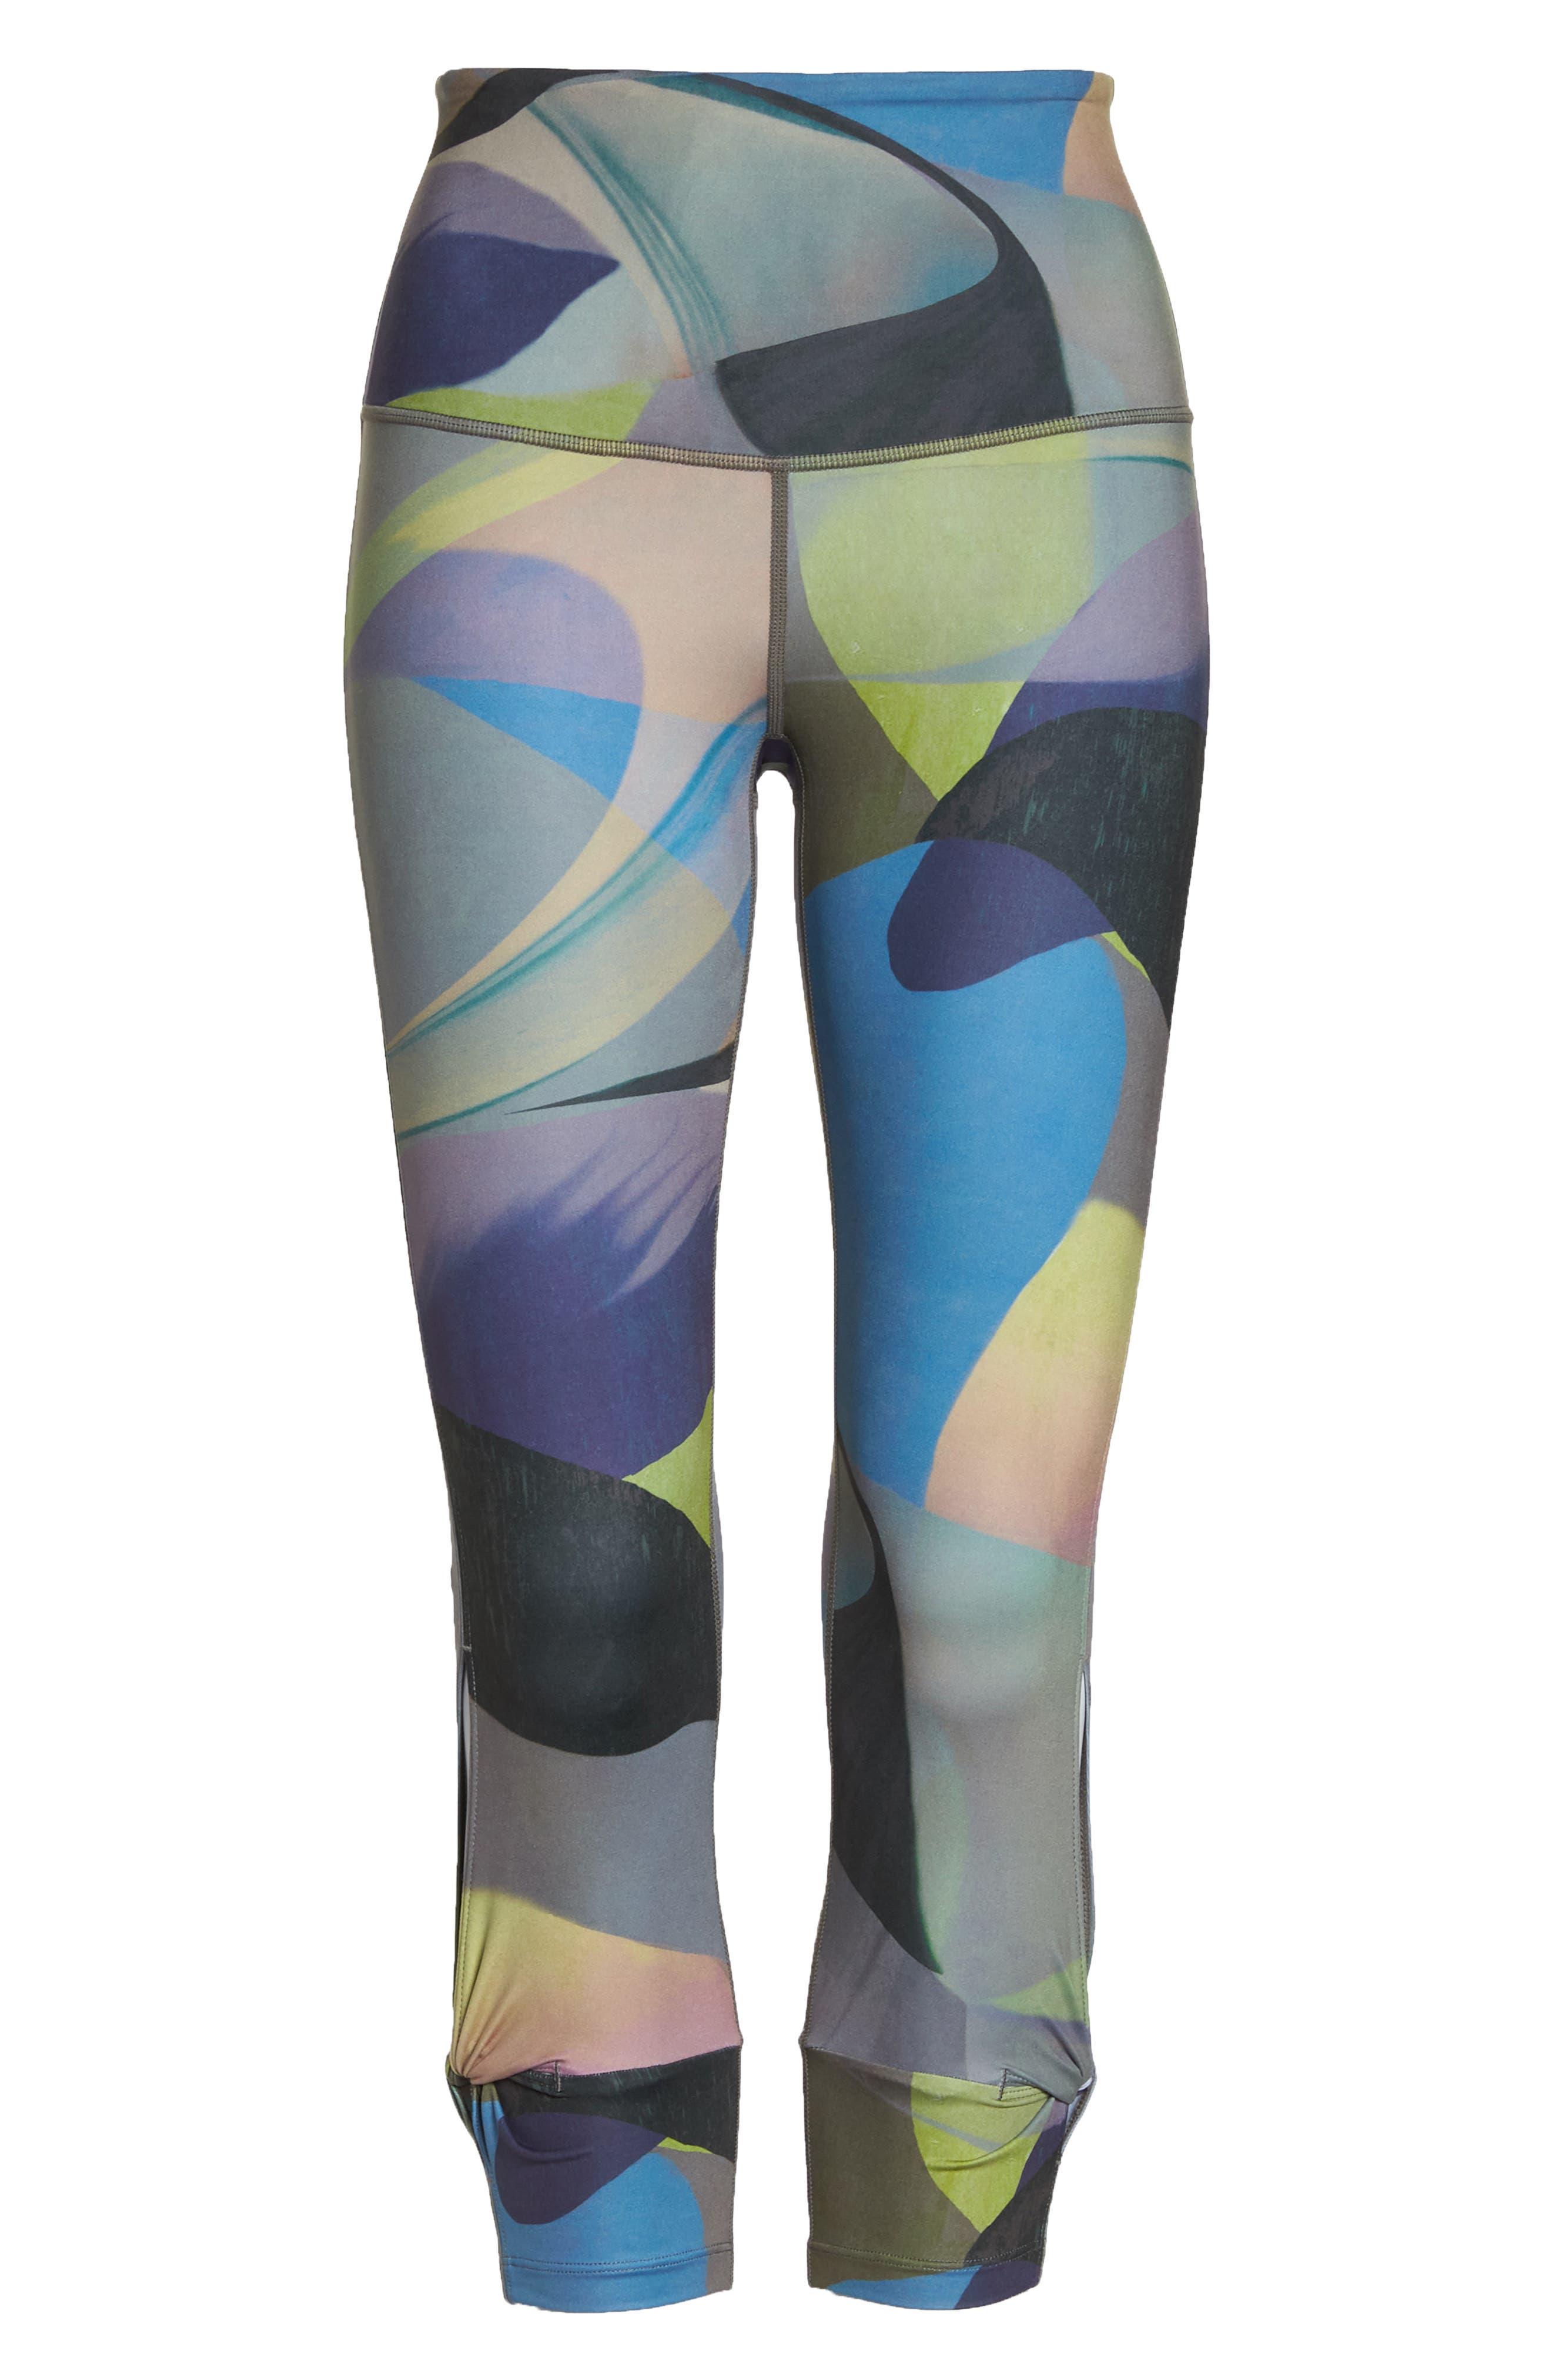 Katya High Waist Abstract Print Recycled Crop Leggings,                             Alternate thumbnail 7, color,                             GREY URBAN ABSTRACT BOTANICAL